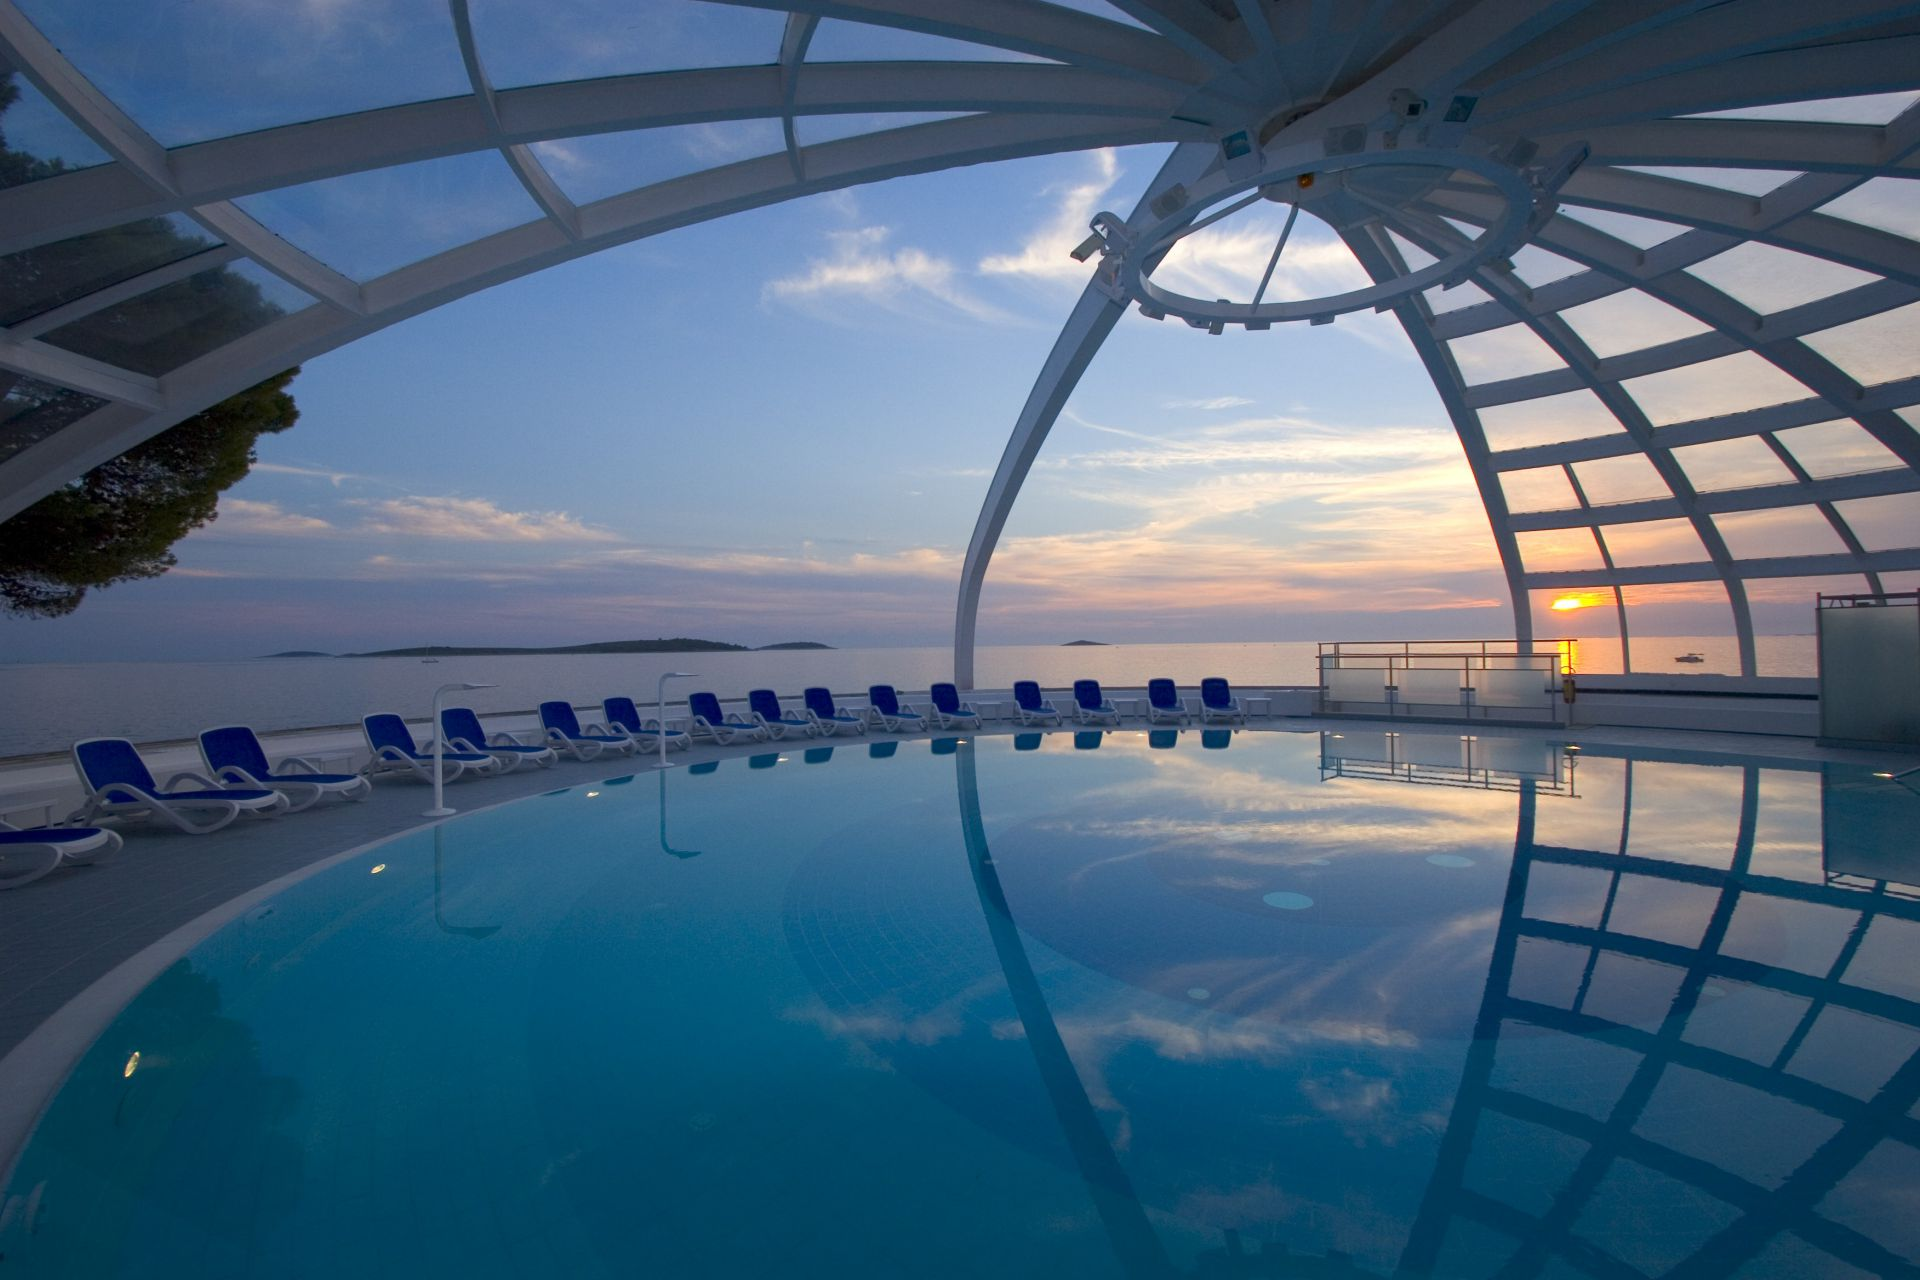 swimming pool 15 14822769161 o - Zora Hotel